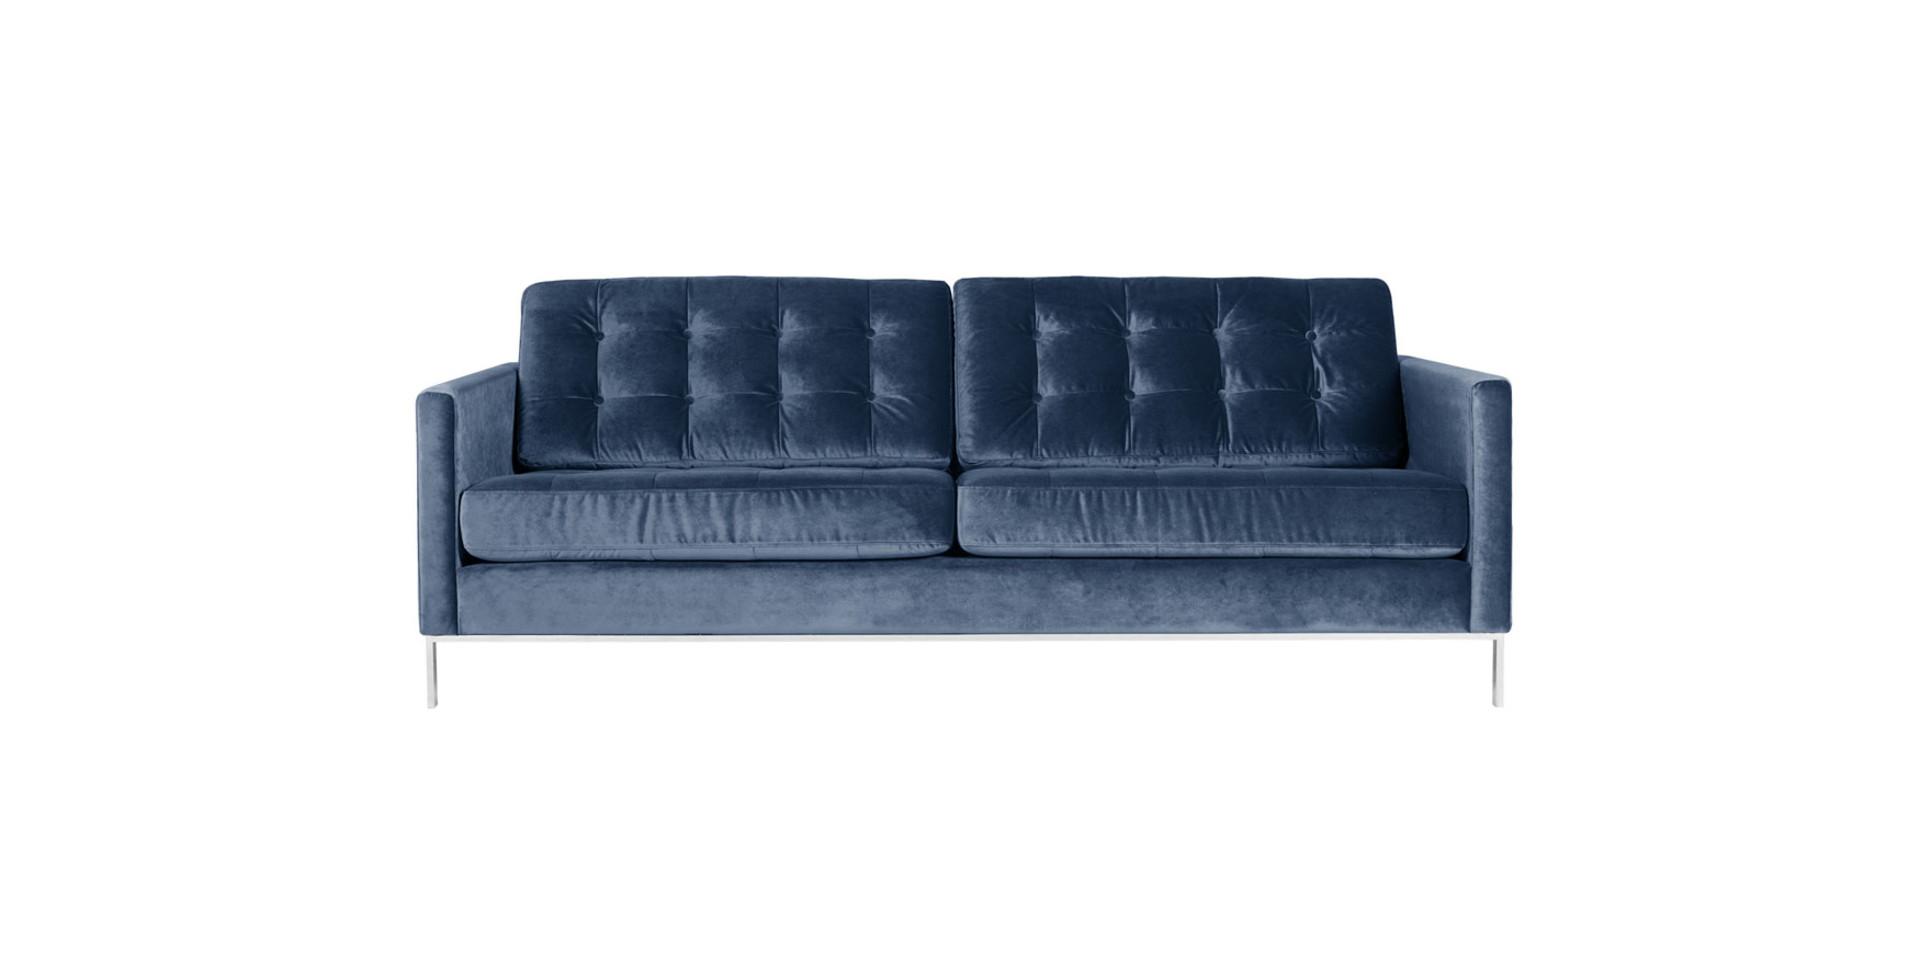 sits-kalle-canape-3seater_classic_velvet12_navy_blue_1